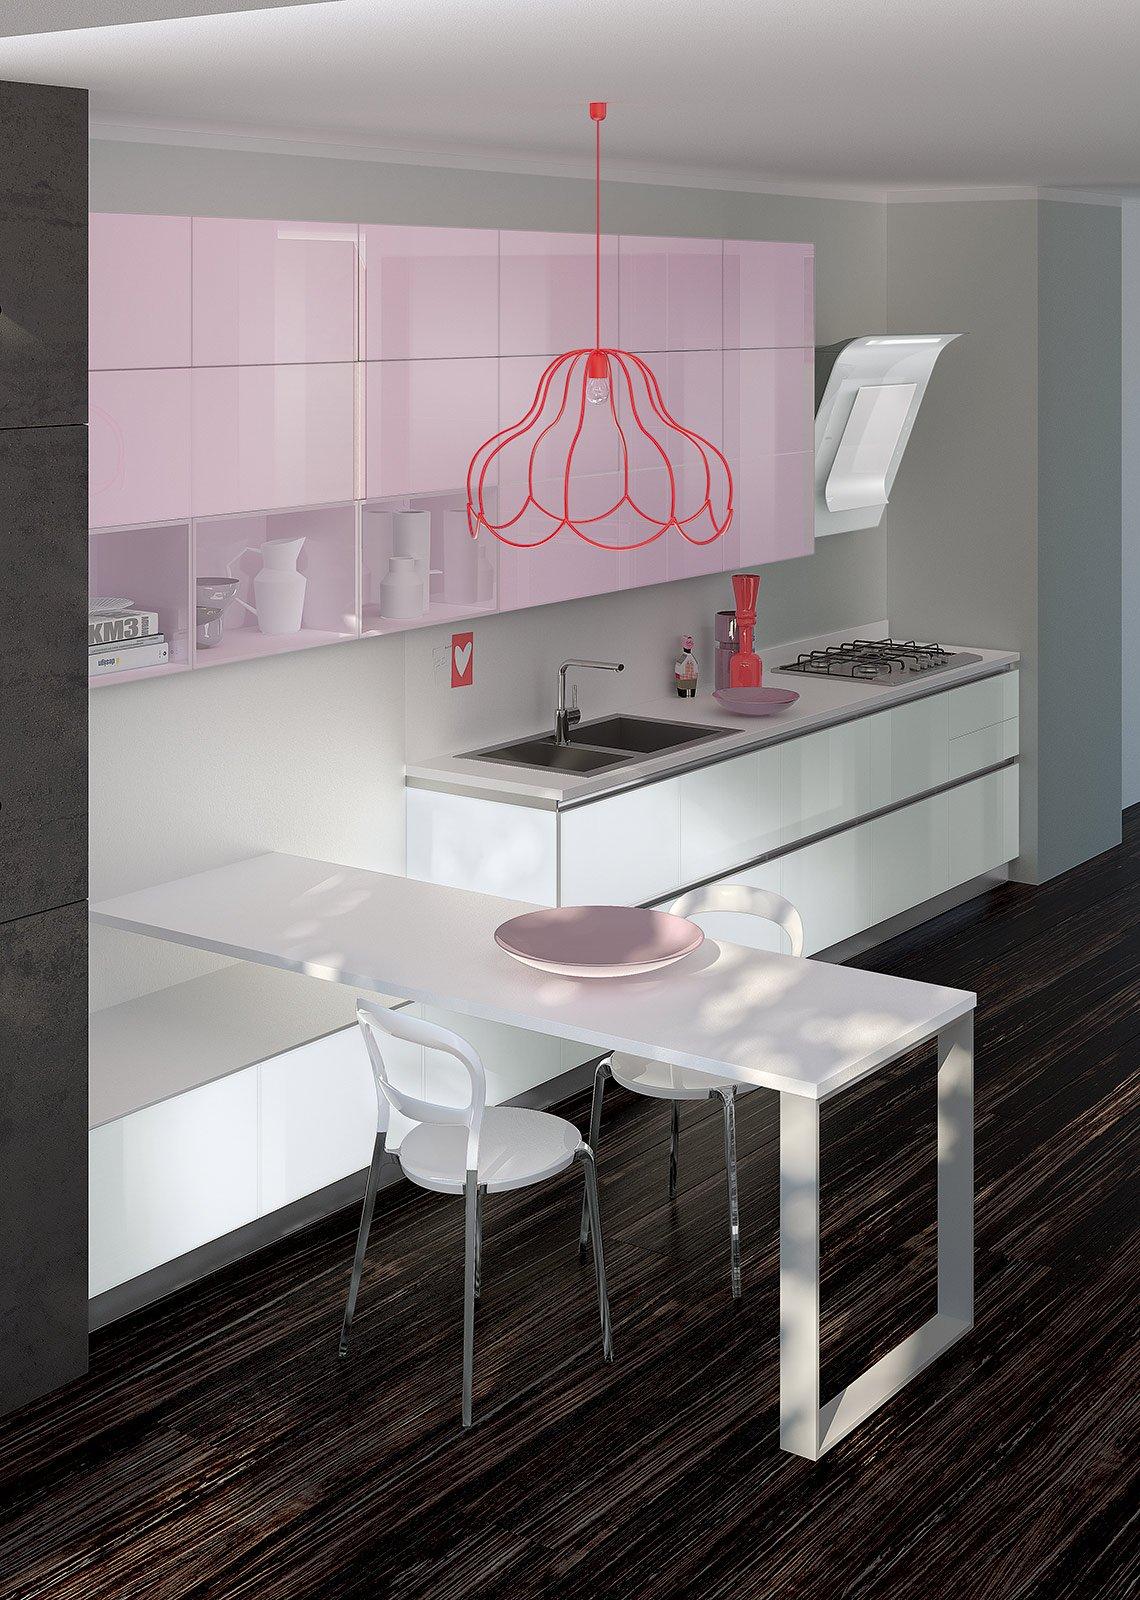 cucine: colori fluo per arredarla - cose di casa - Cucine Bianche E Grigie Scavolini